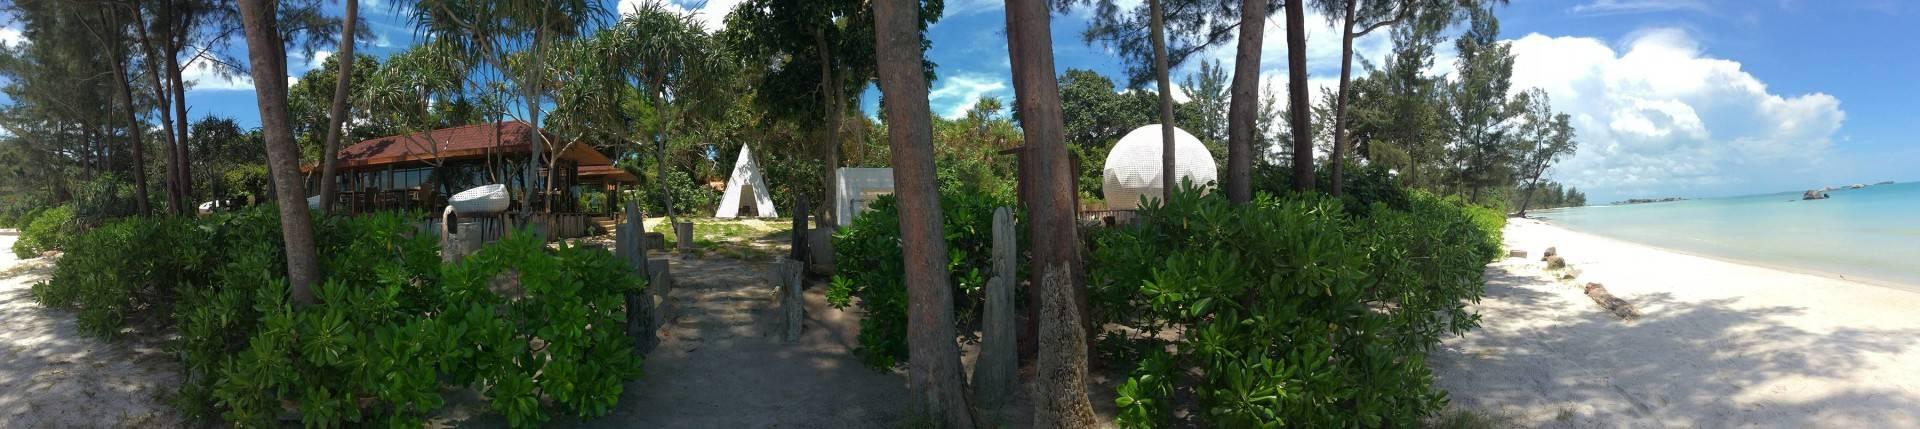 Raw Architecture Arumdalu Belitung Belitung Beach View Tropis  1632